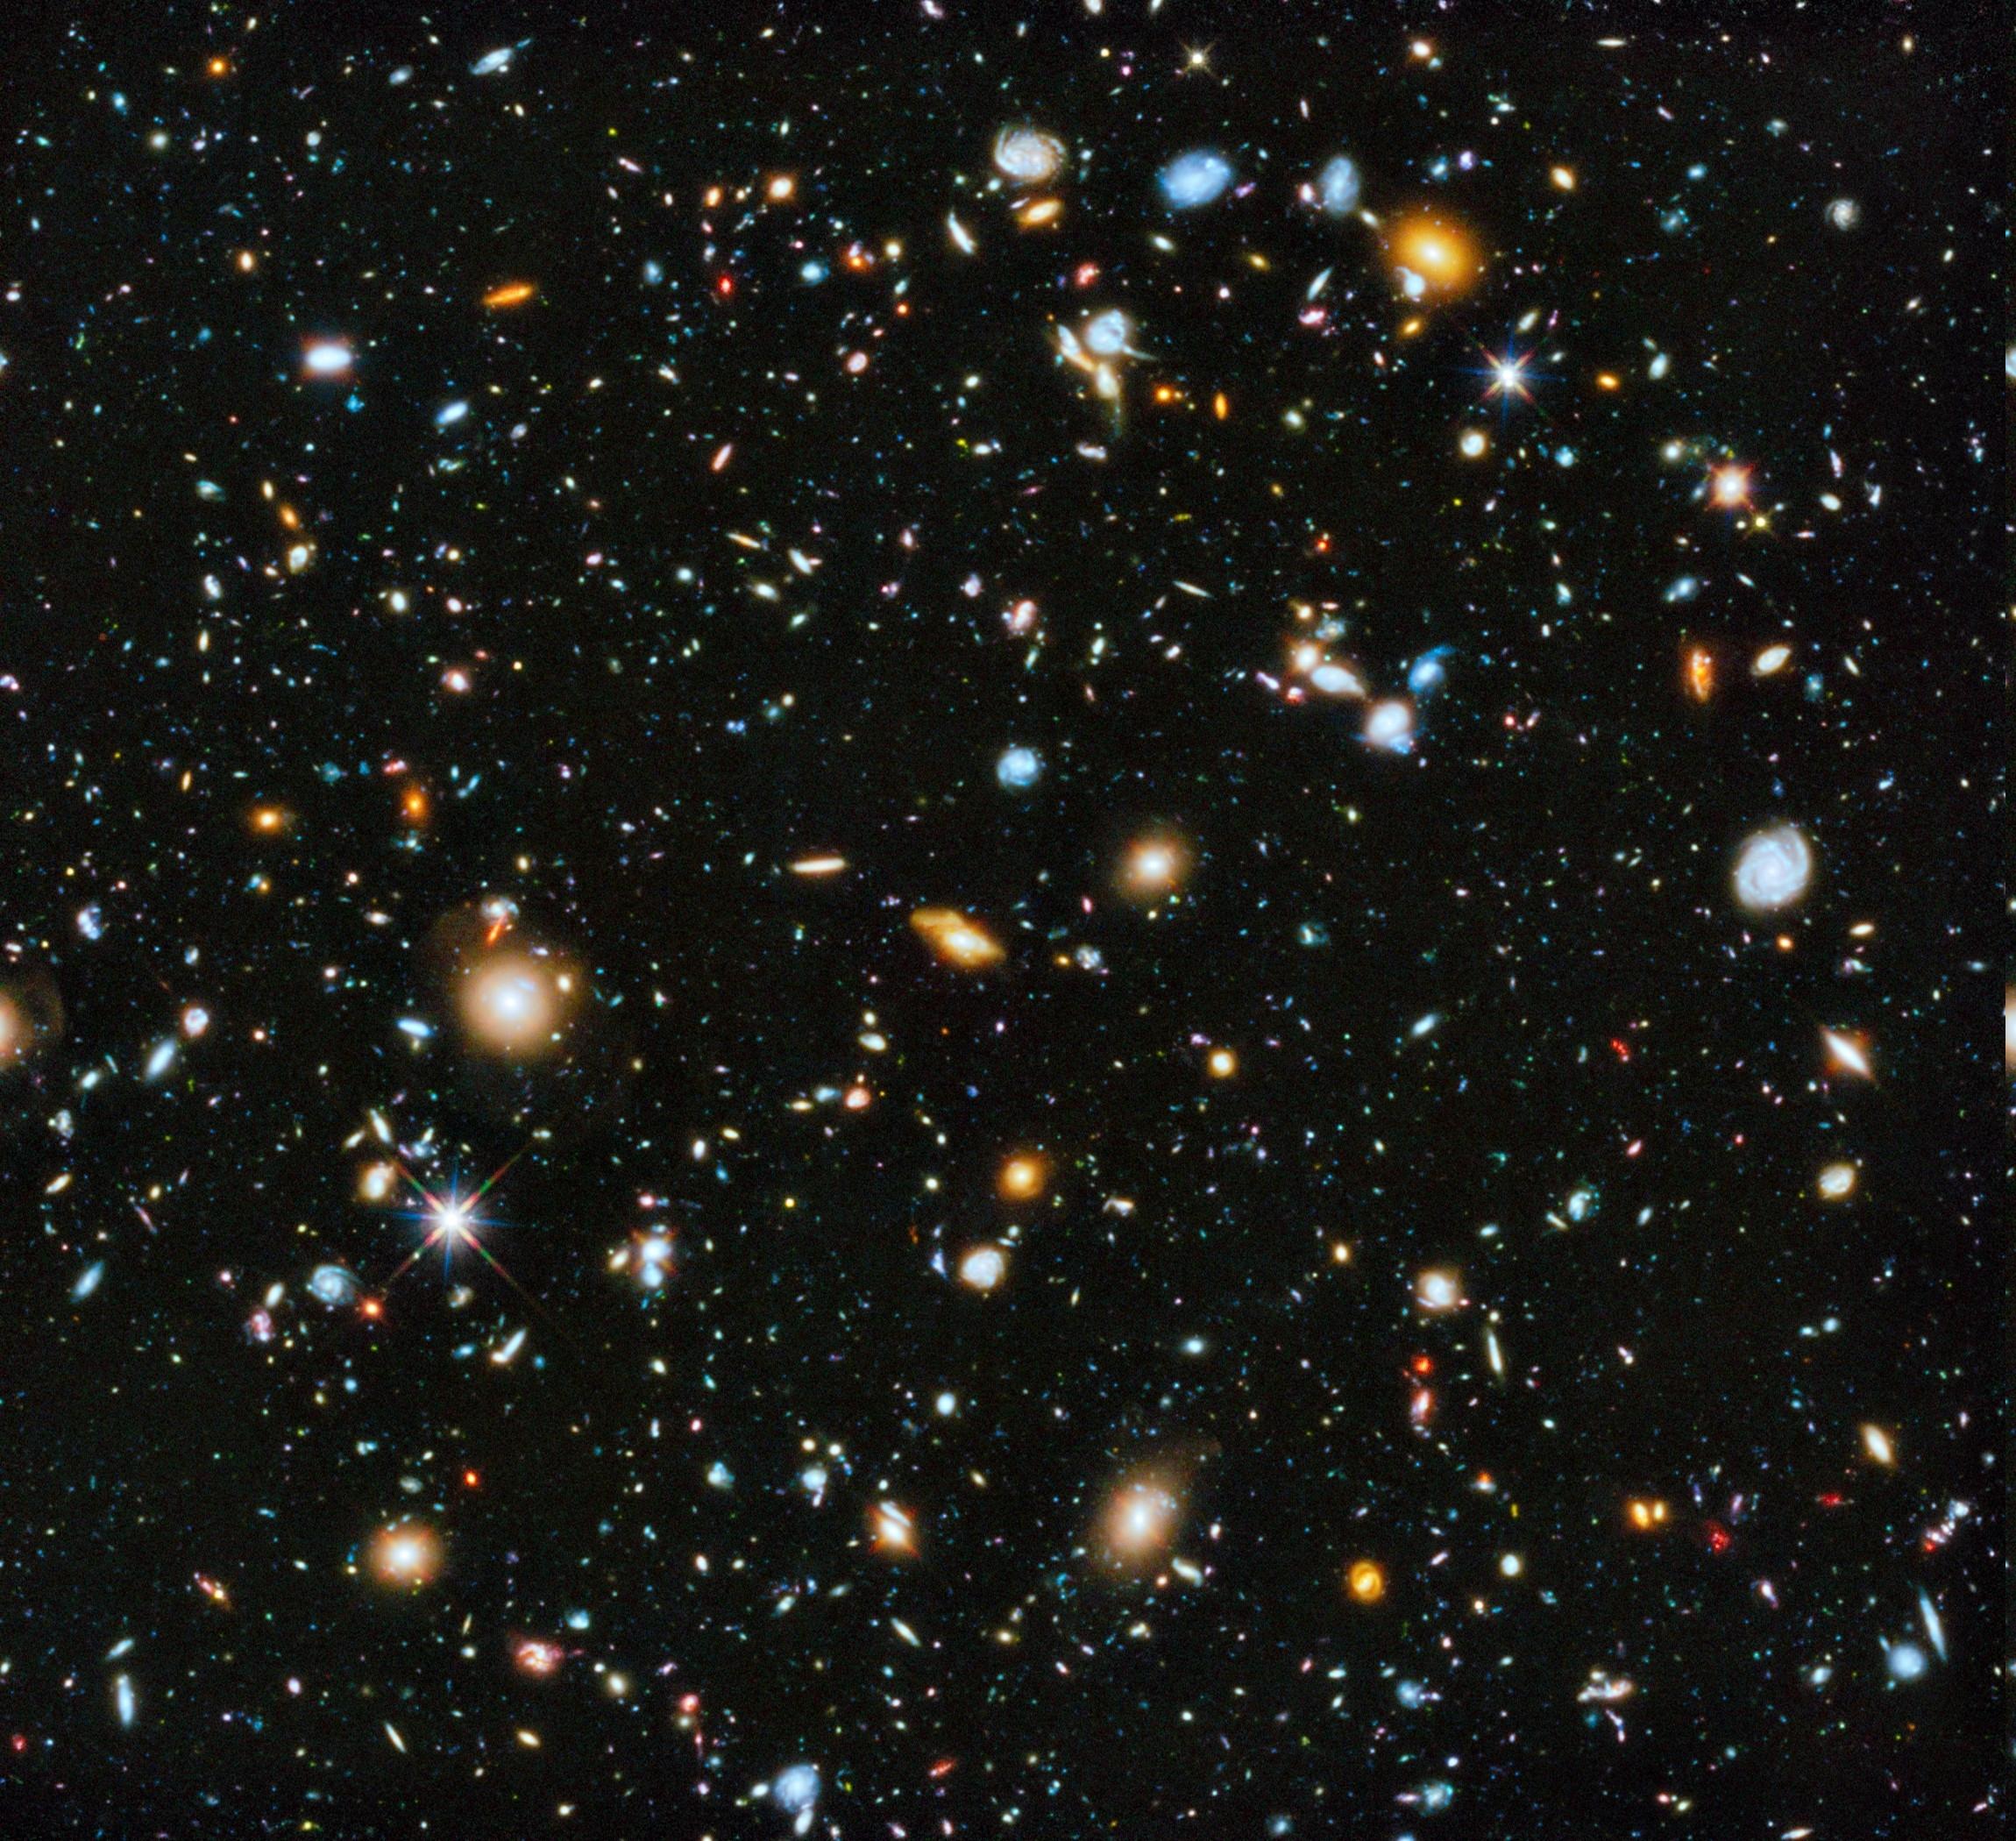 wallpaper : 2300x2100 px, deep space, galaxy, hubble deep field